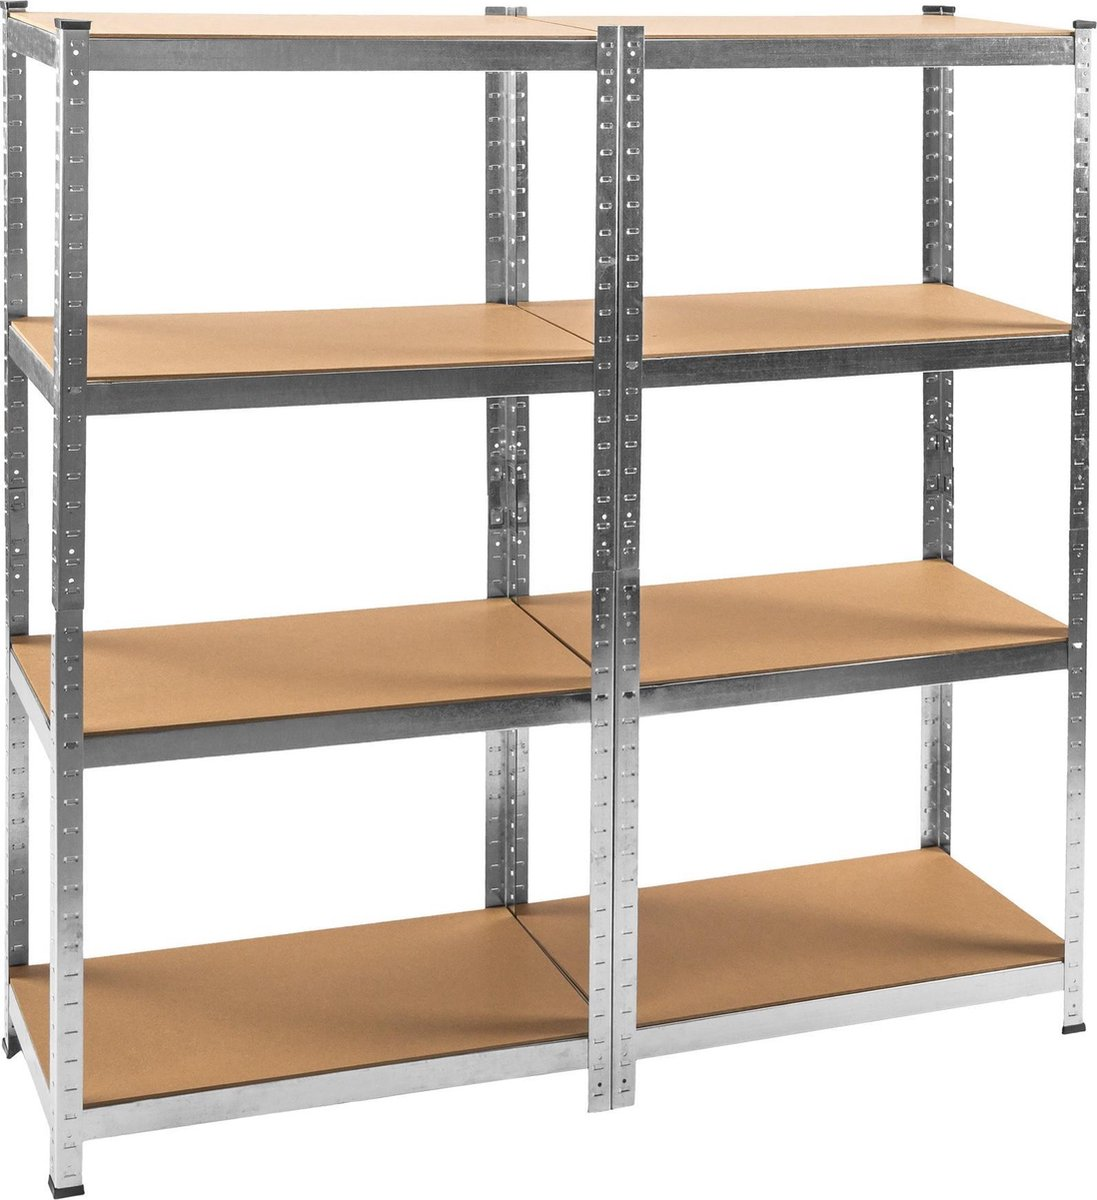 TecTake - stevige legbordstelling - 8 legborden - afm. 160x160x40 - 402171